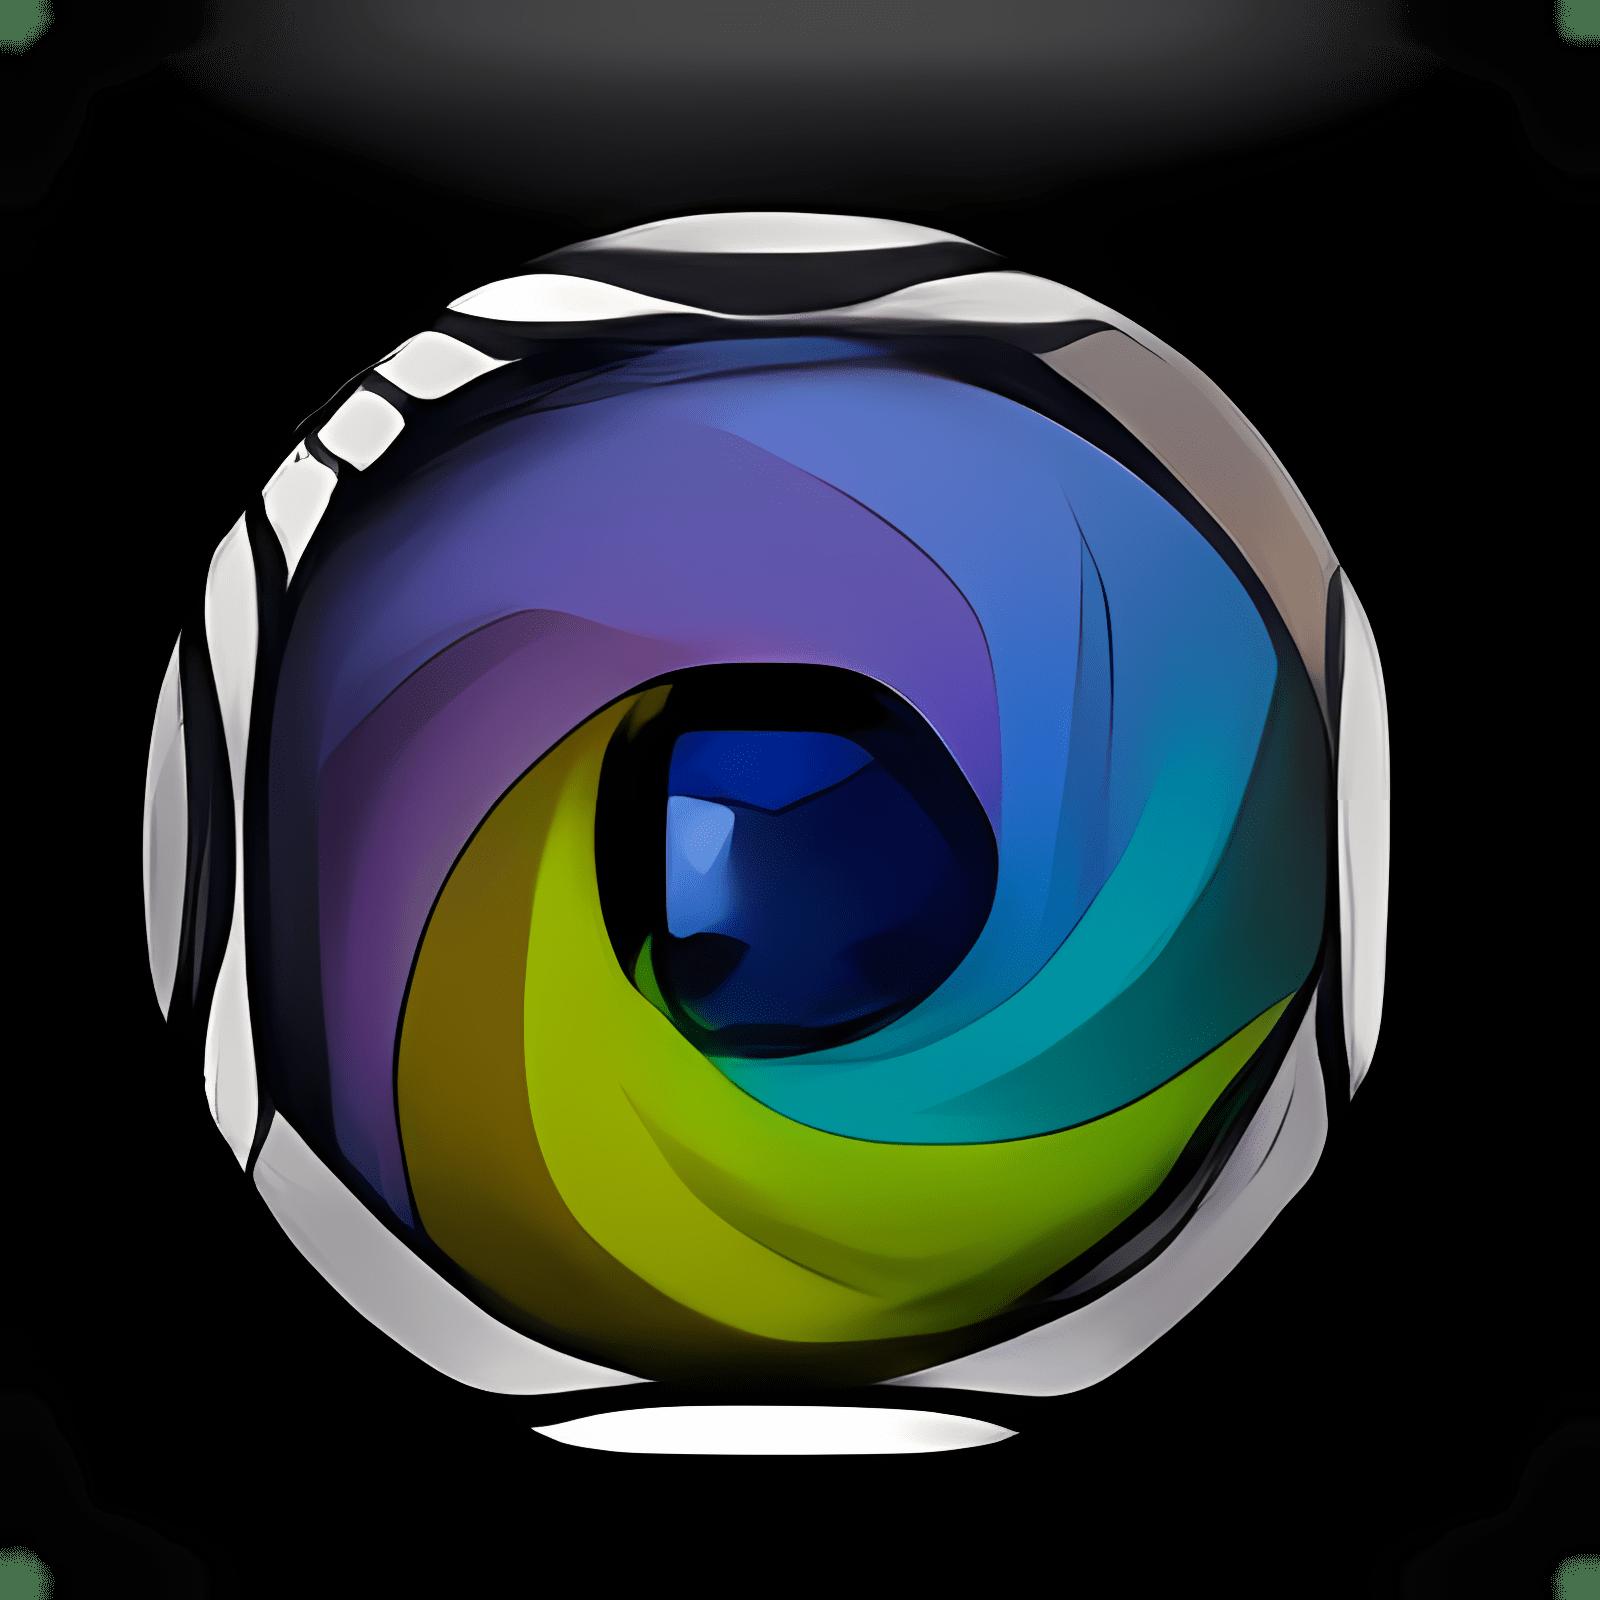 CyberLink PhotoDirector for Mac